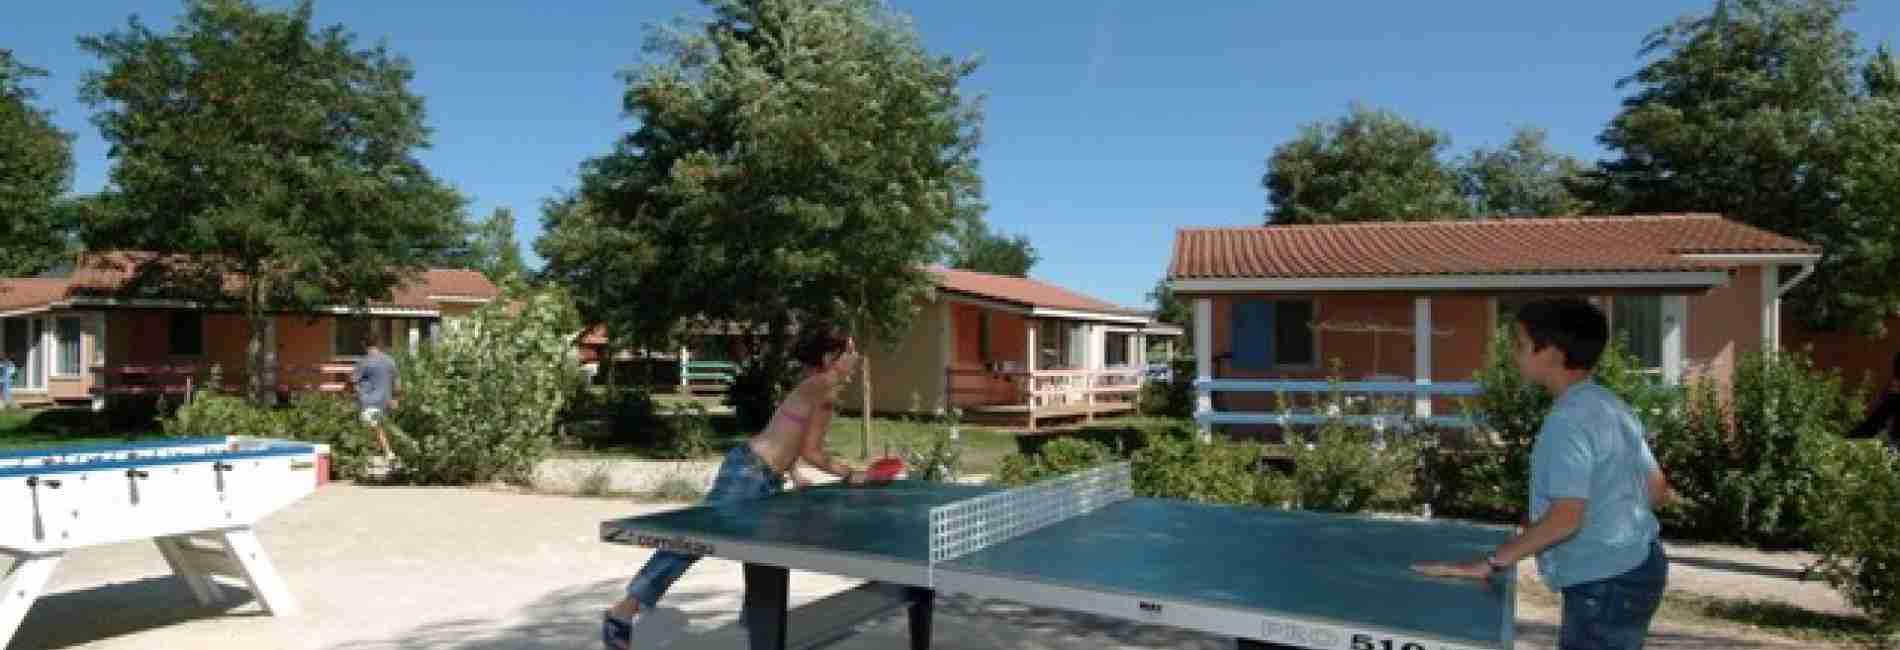 ping_pong-village-de-gite.jpg